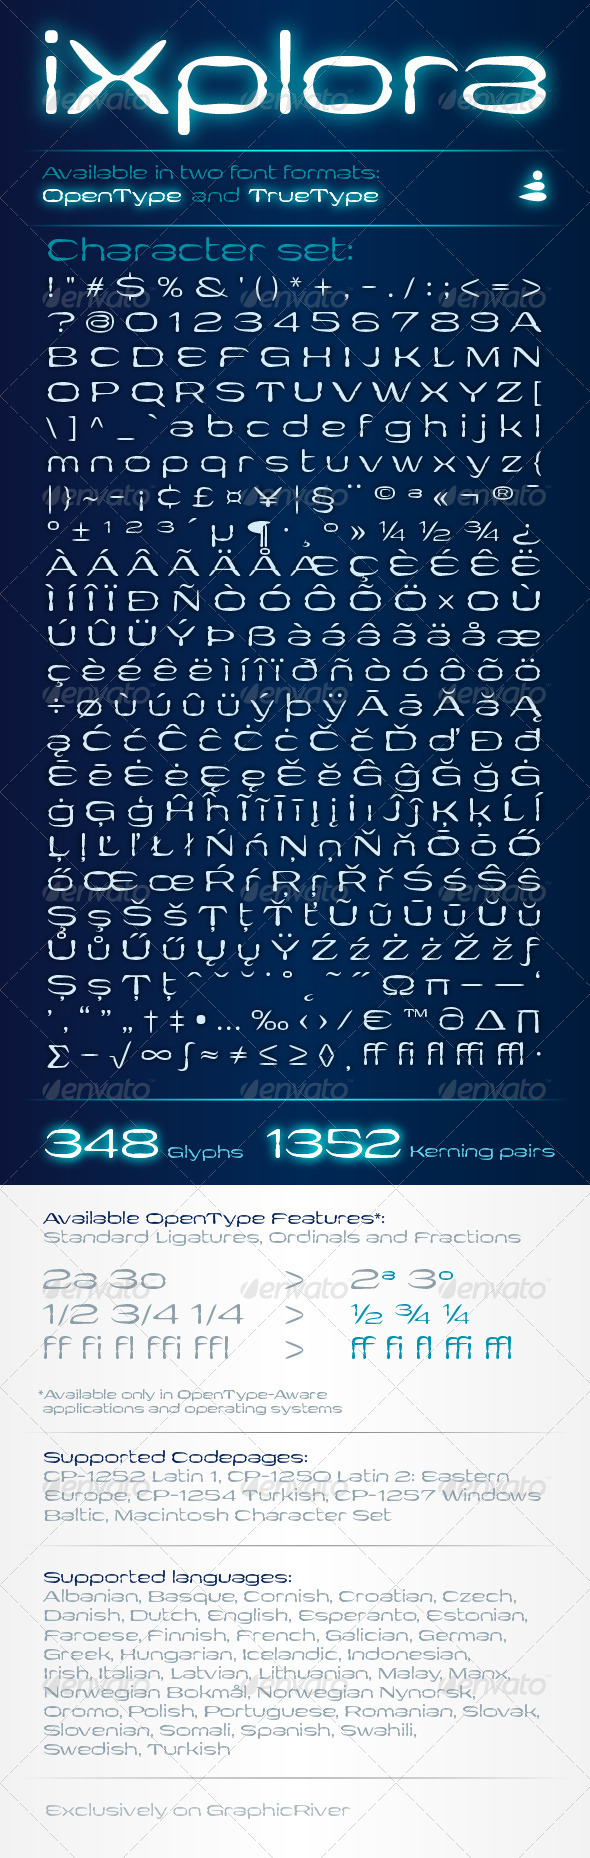 GraphicRiver iXplora typeface 6488720